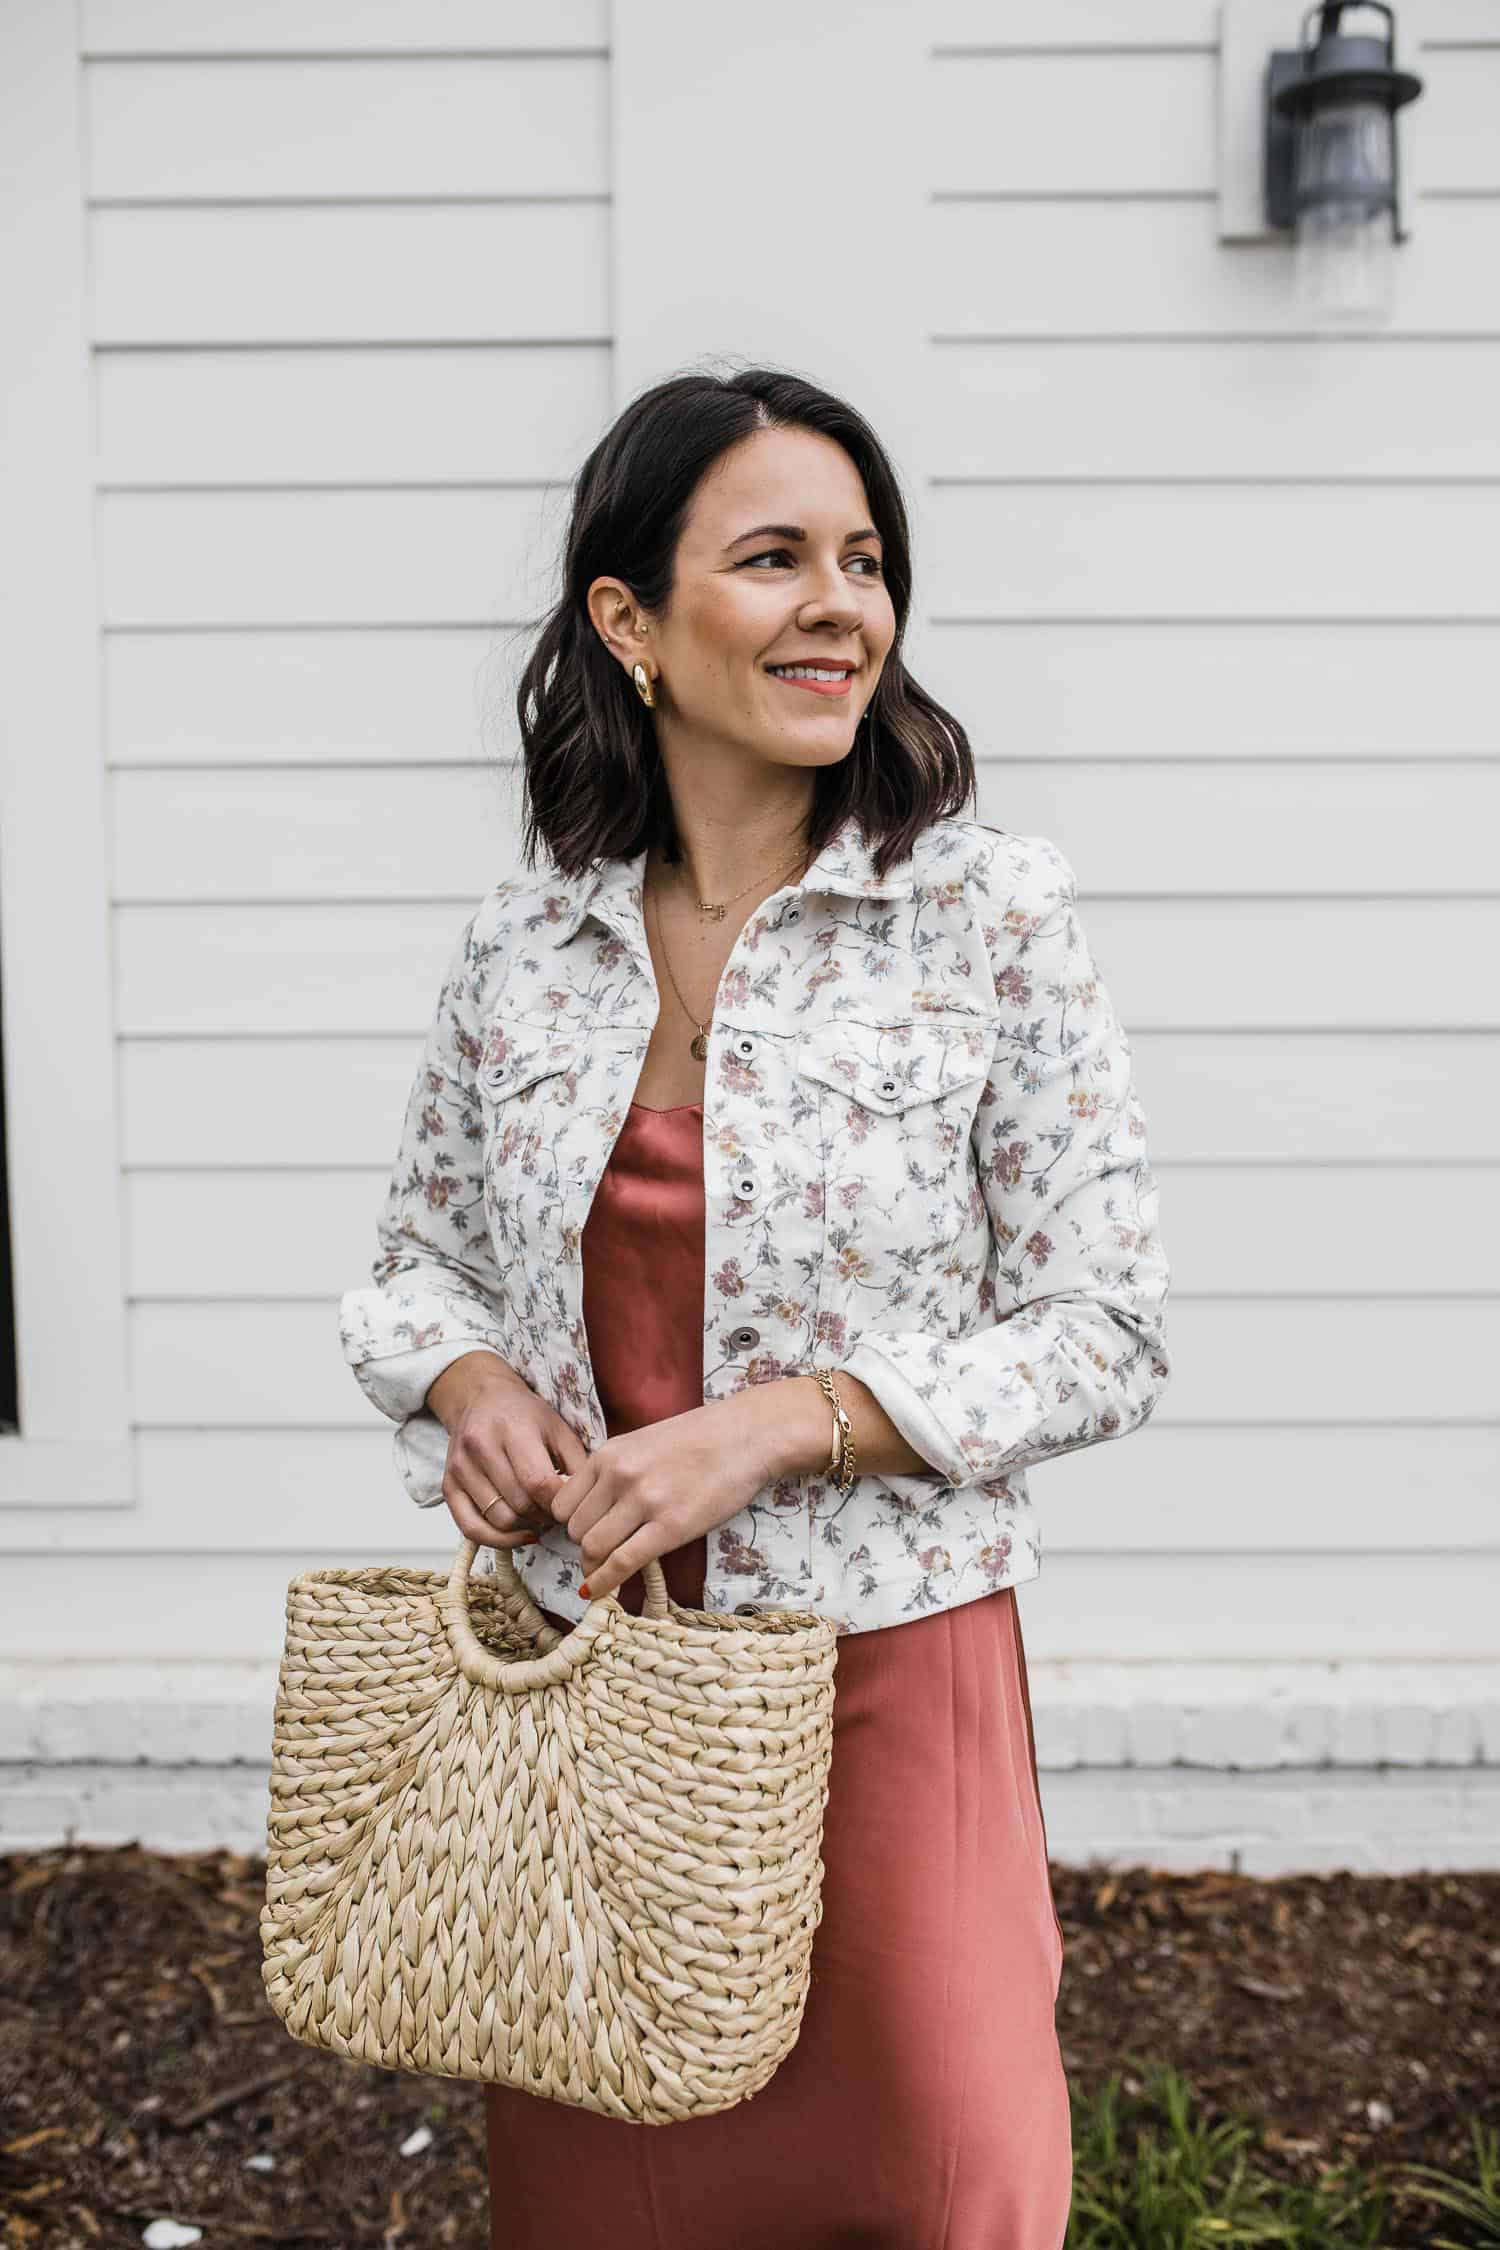 floral printed denim jacket and straw tote